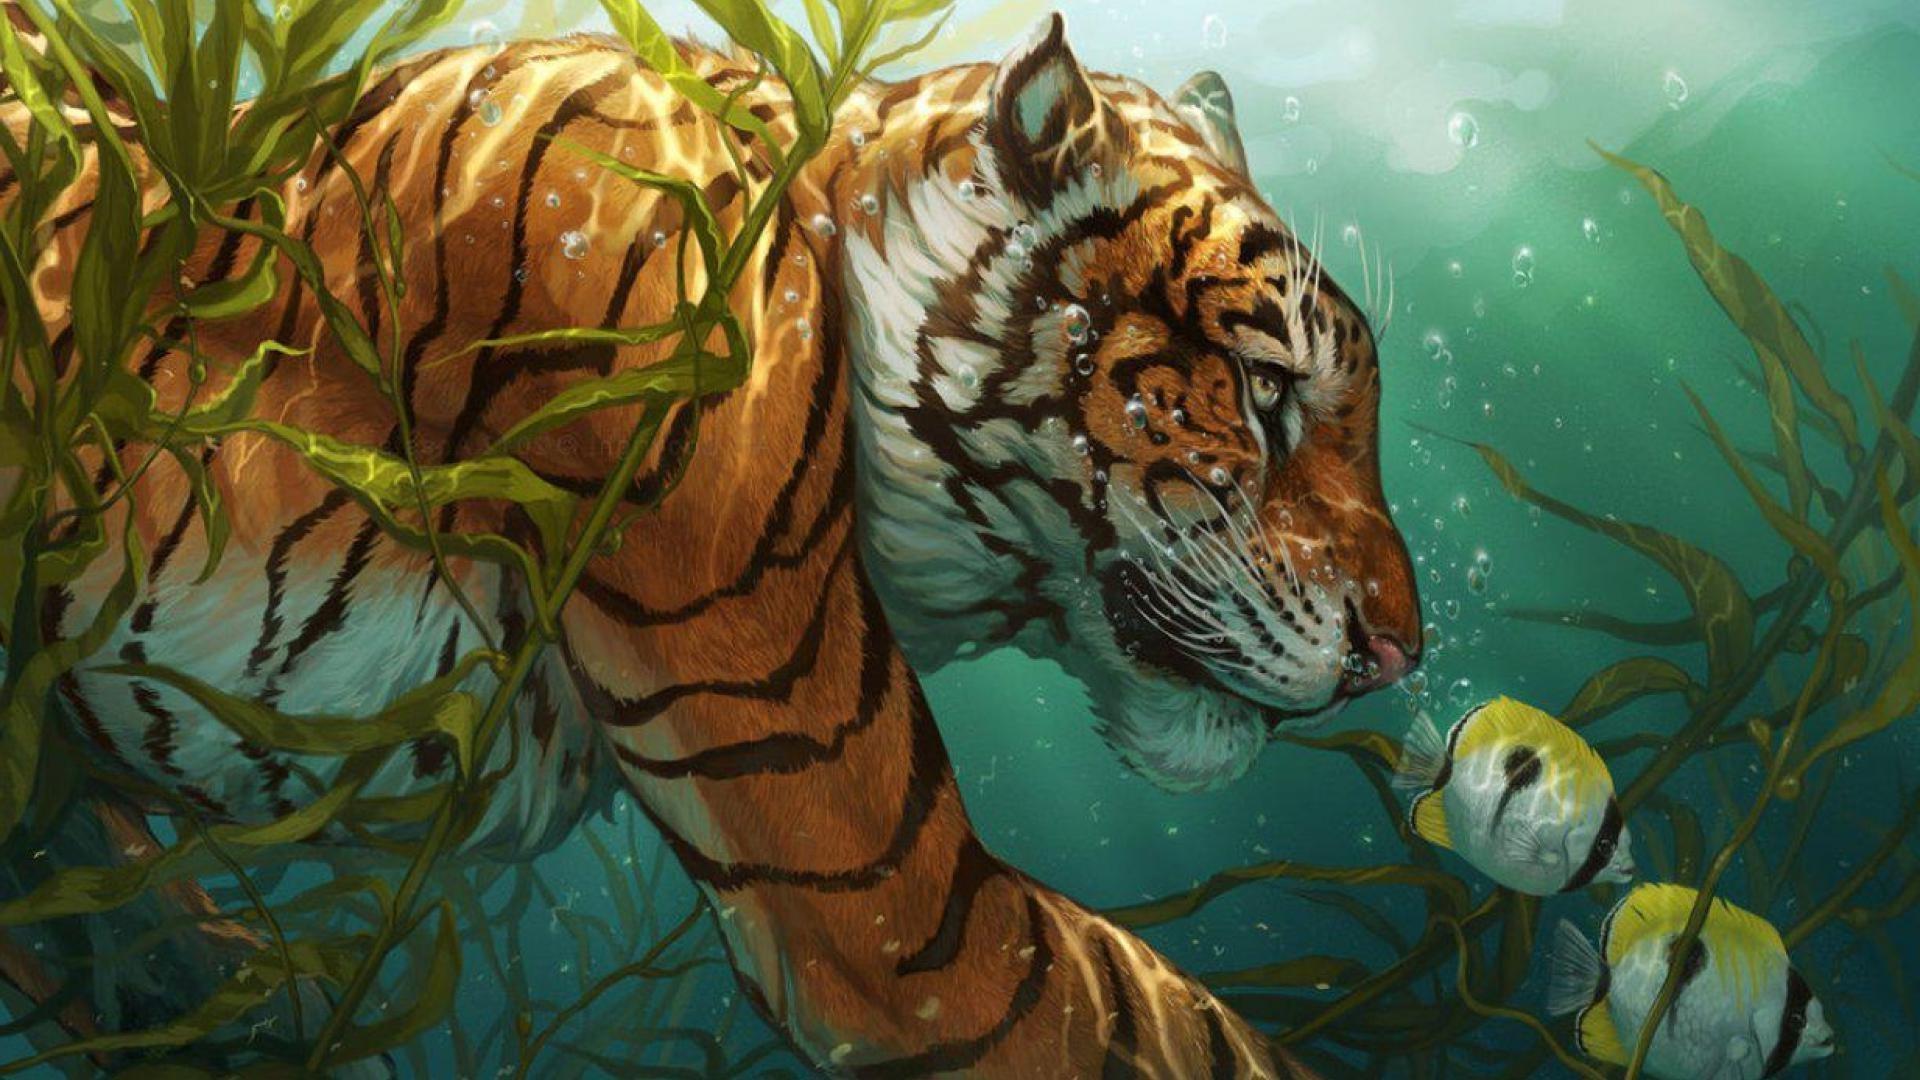 Tropical Ocean 3d Live Wallpaper Underwater Hd Wallpapers 1920x1080 79 Images